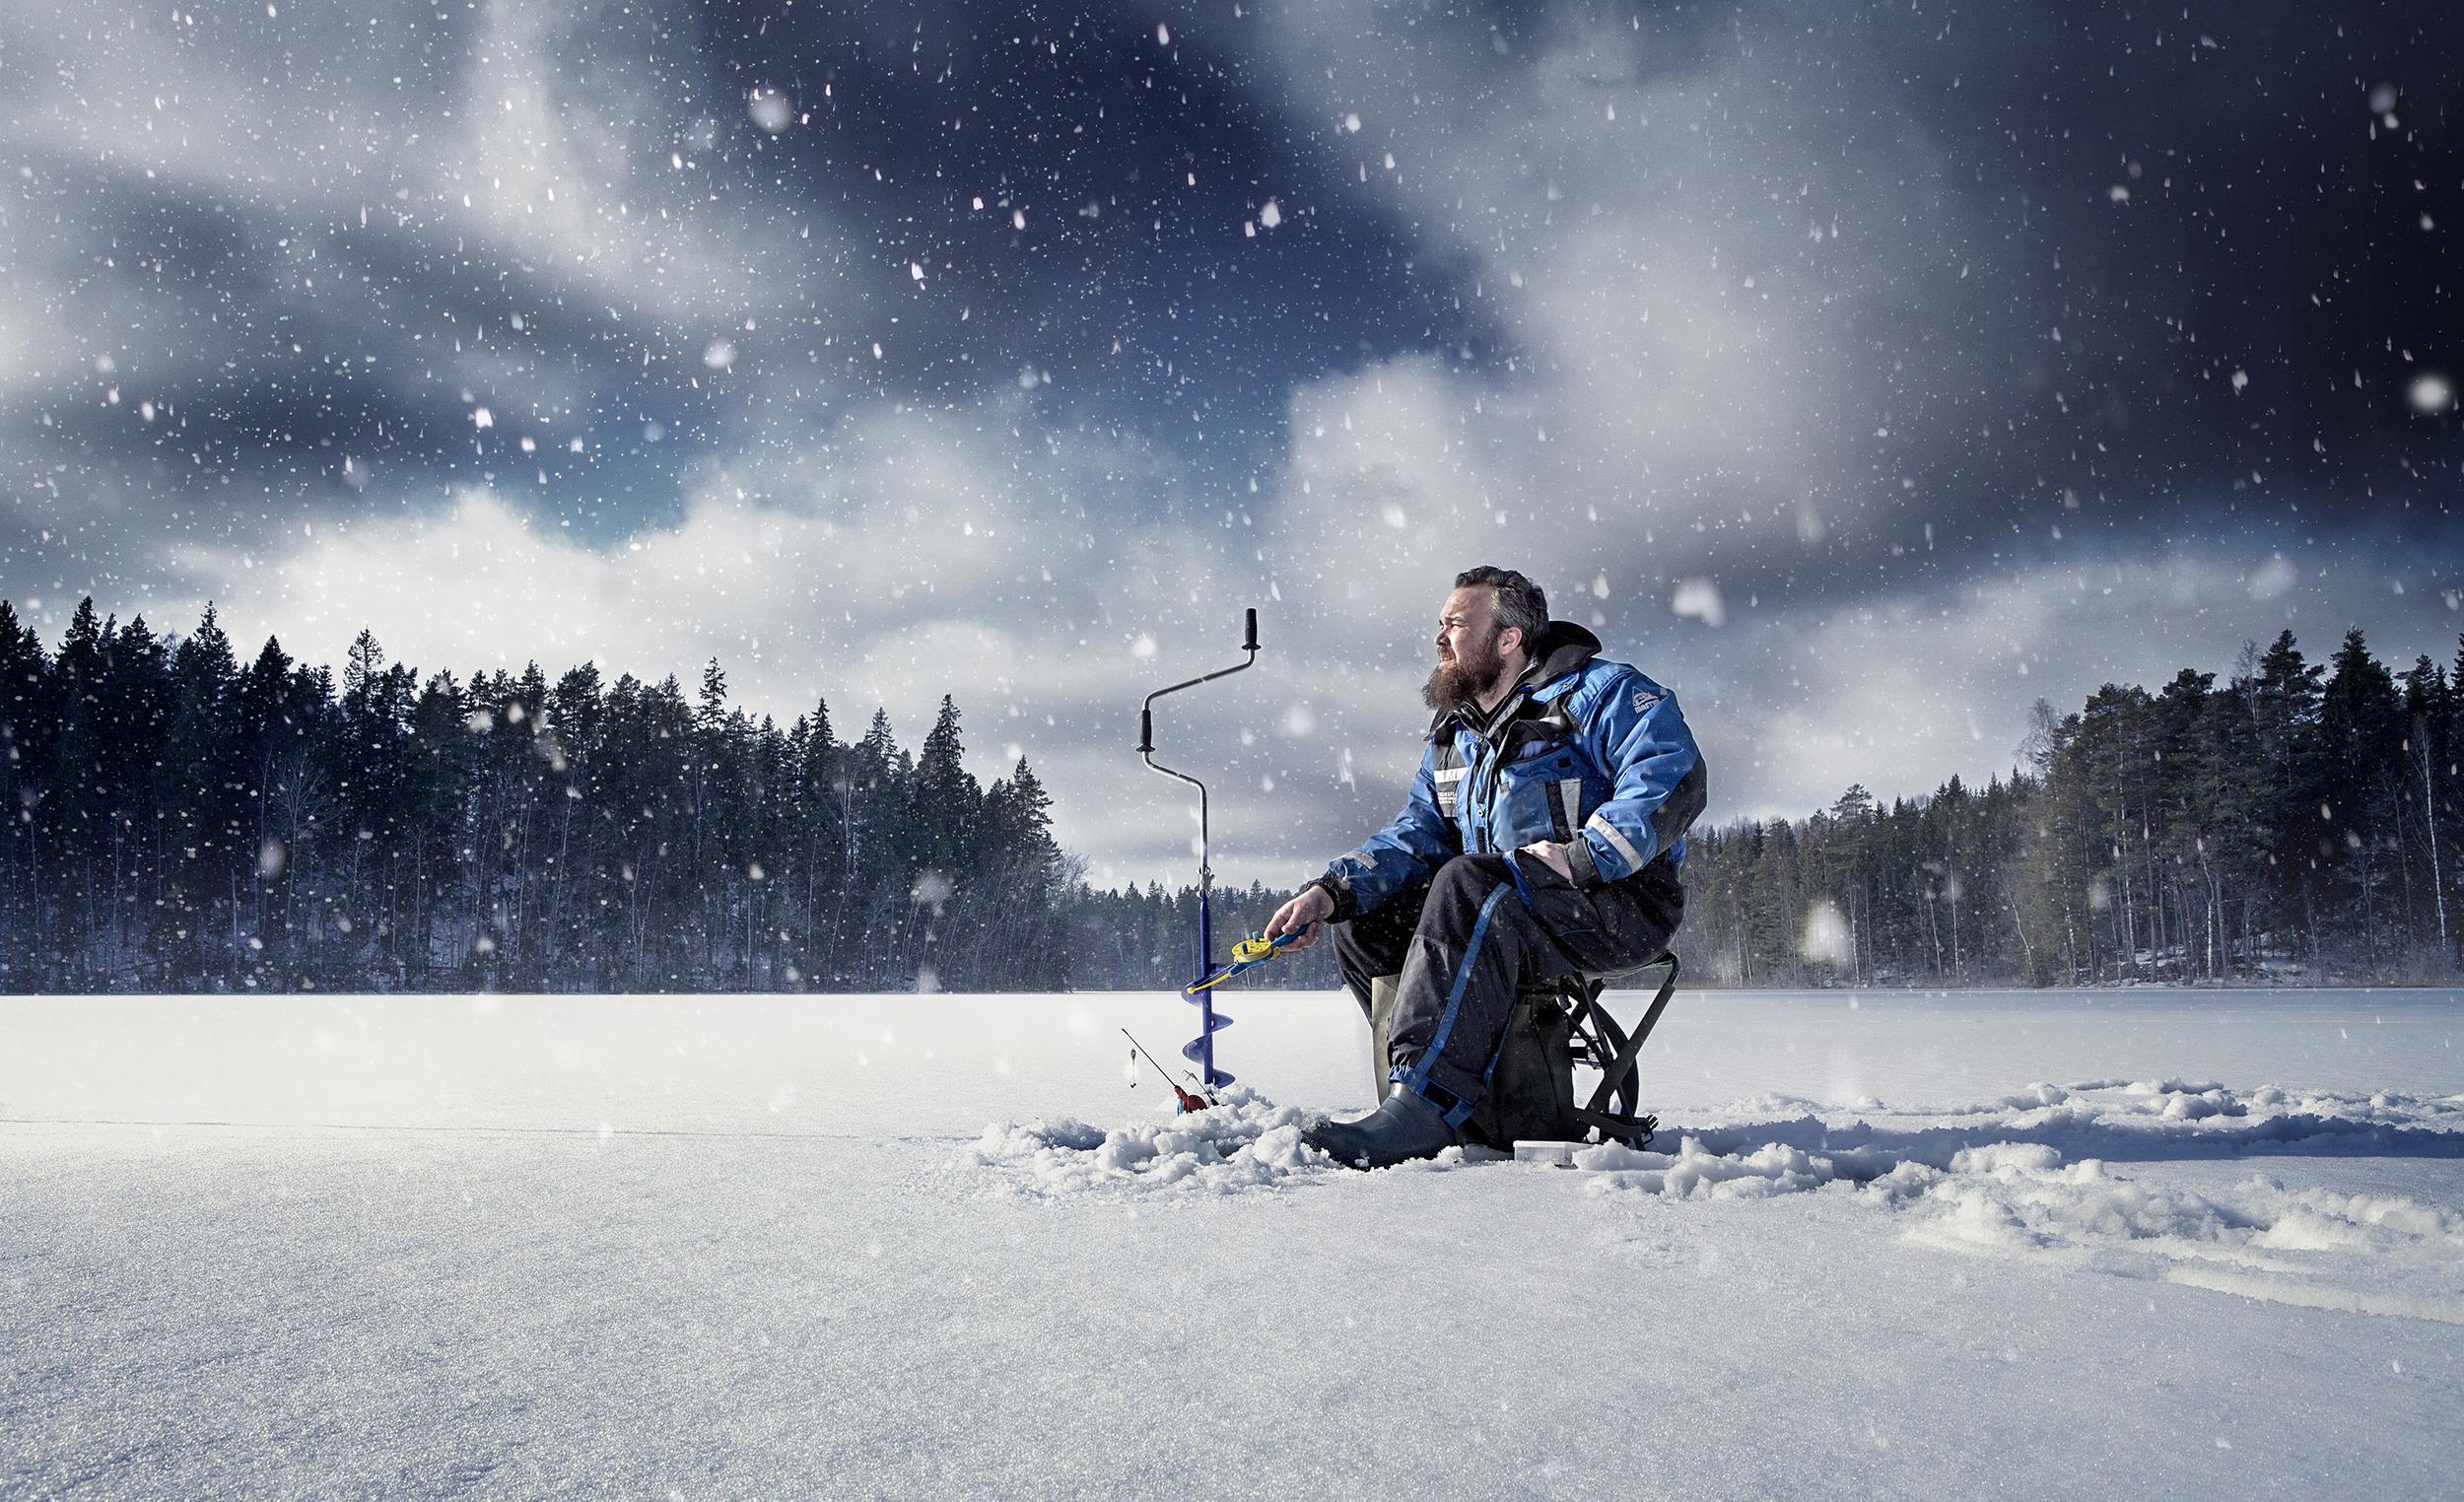 icefishing0003.jpg